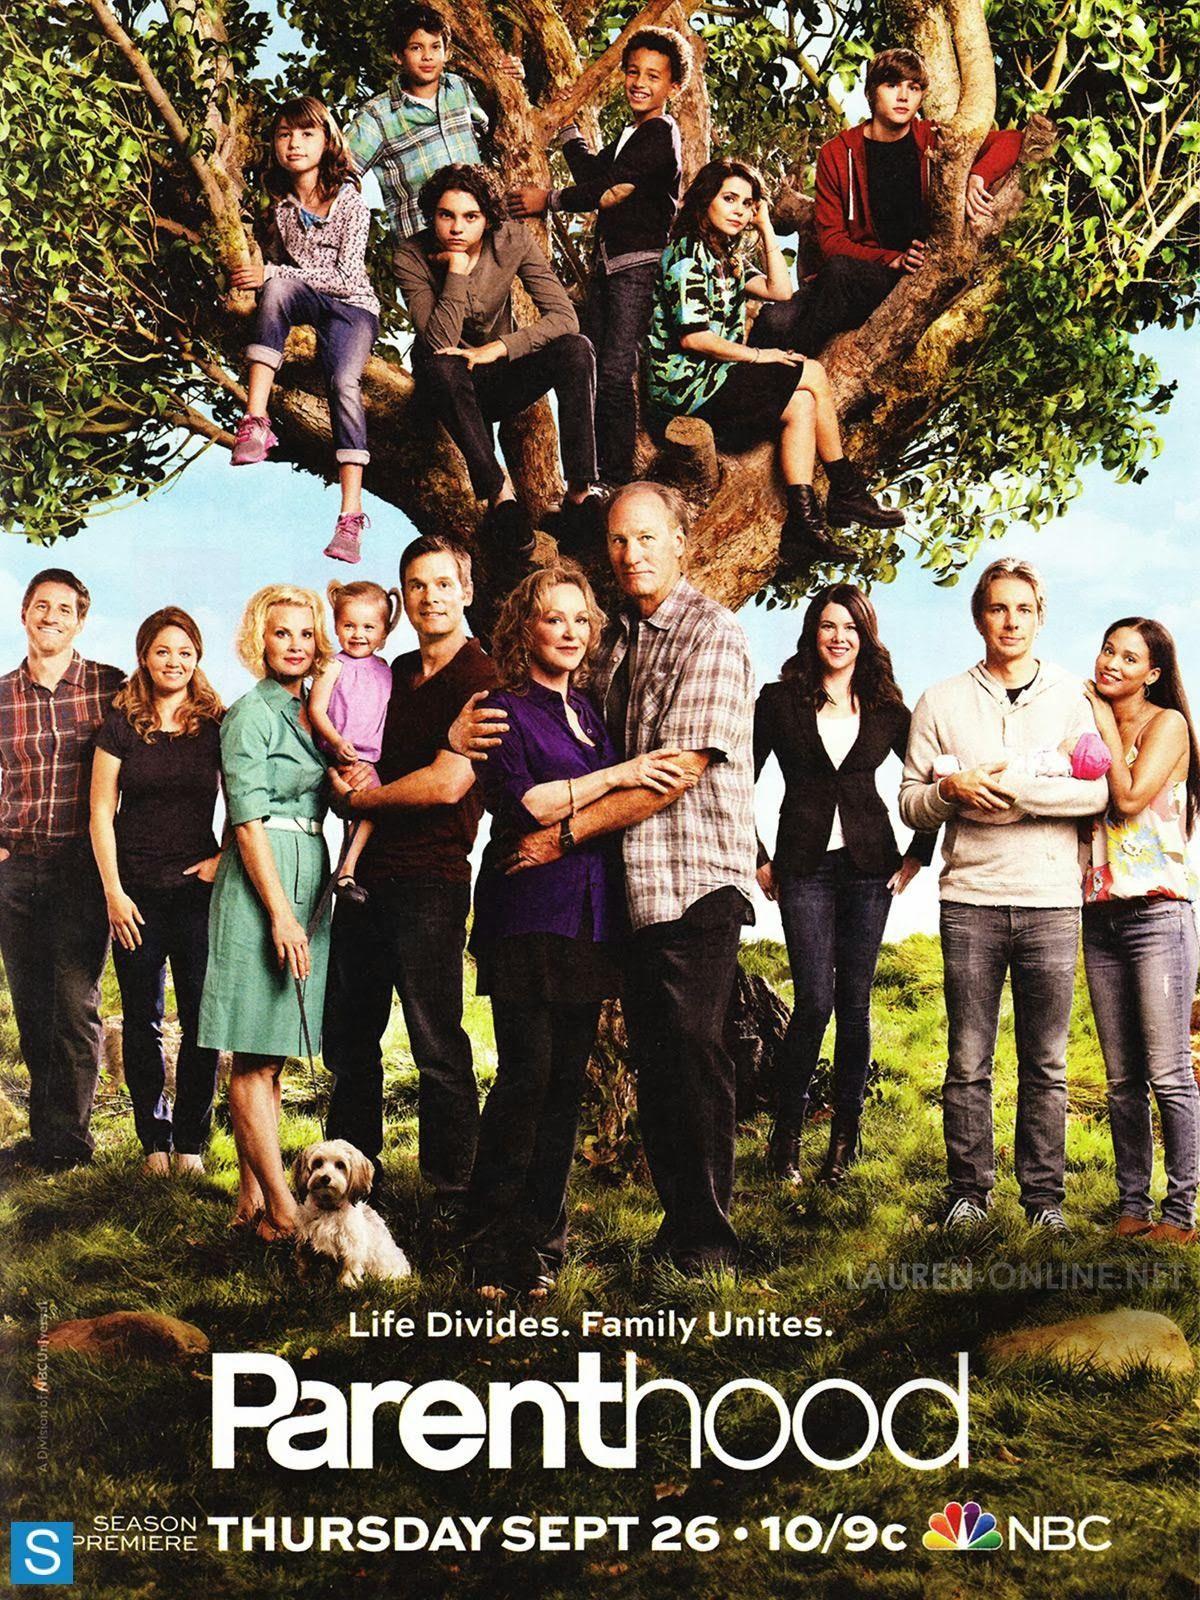 Parenthood Season 5 Parenthood Tv Show Tv Series To Watch